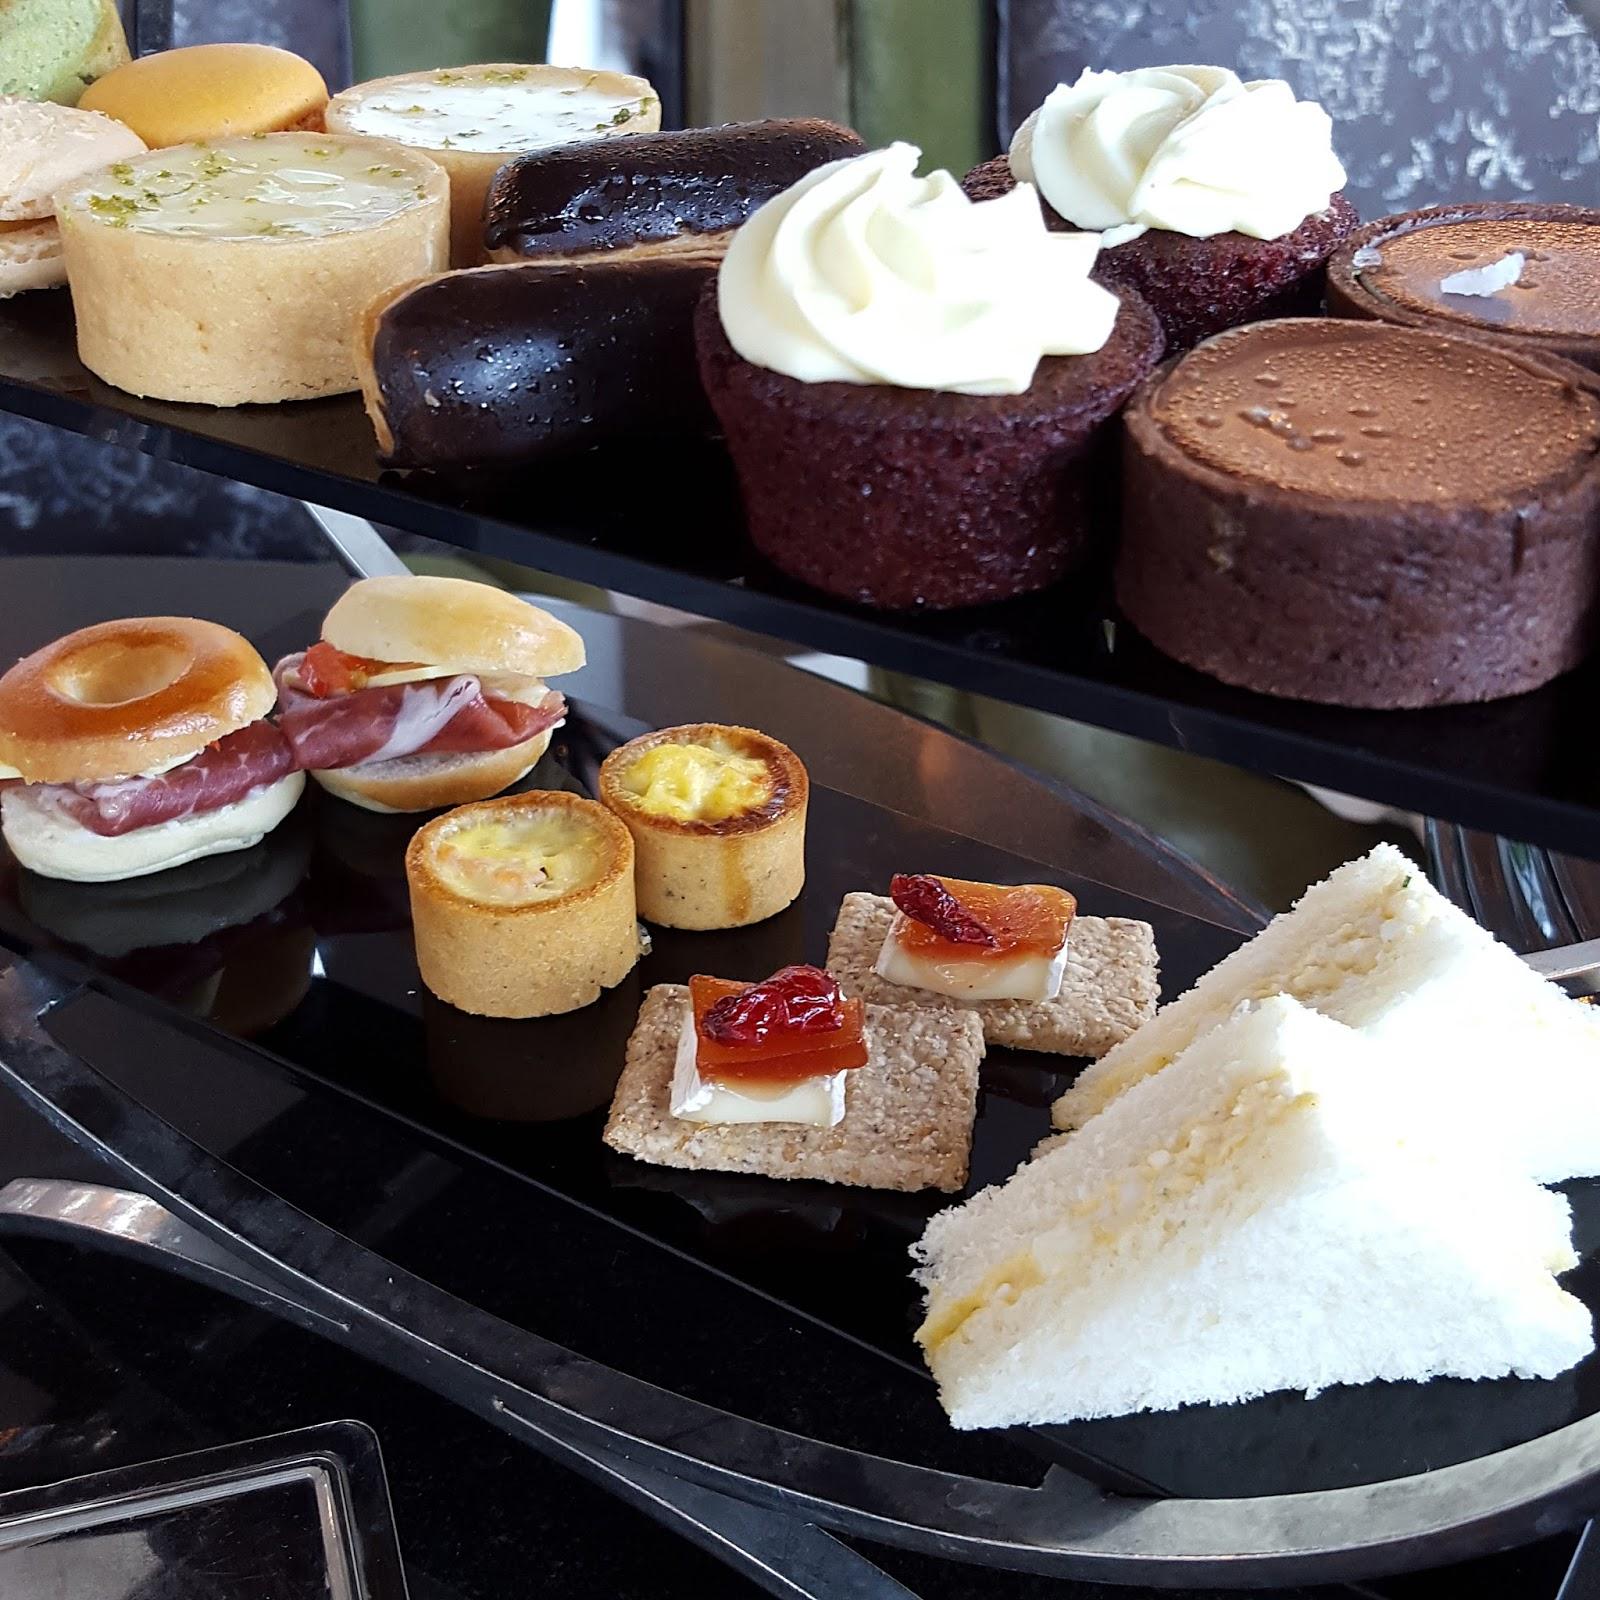 Fullerton Hotel High Tea: FoodieFC: The Landing Point Afternoon High Tea Buffet (The